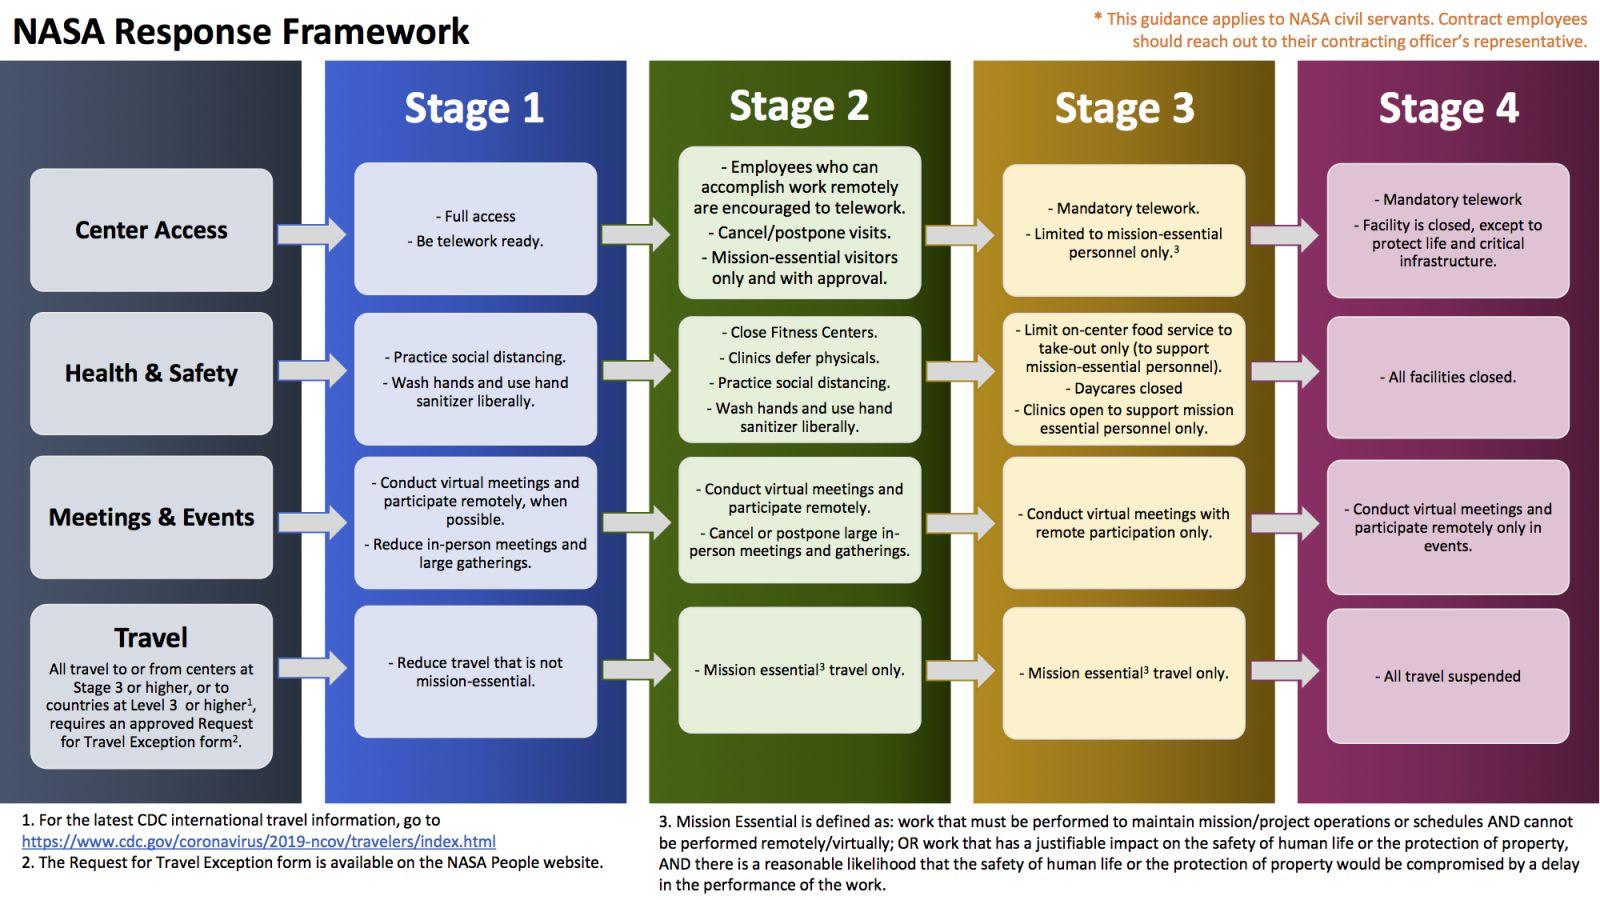 nasa response framework